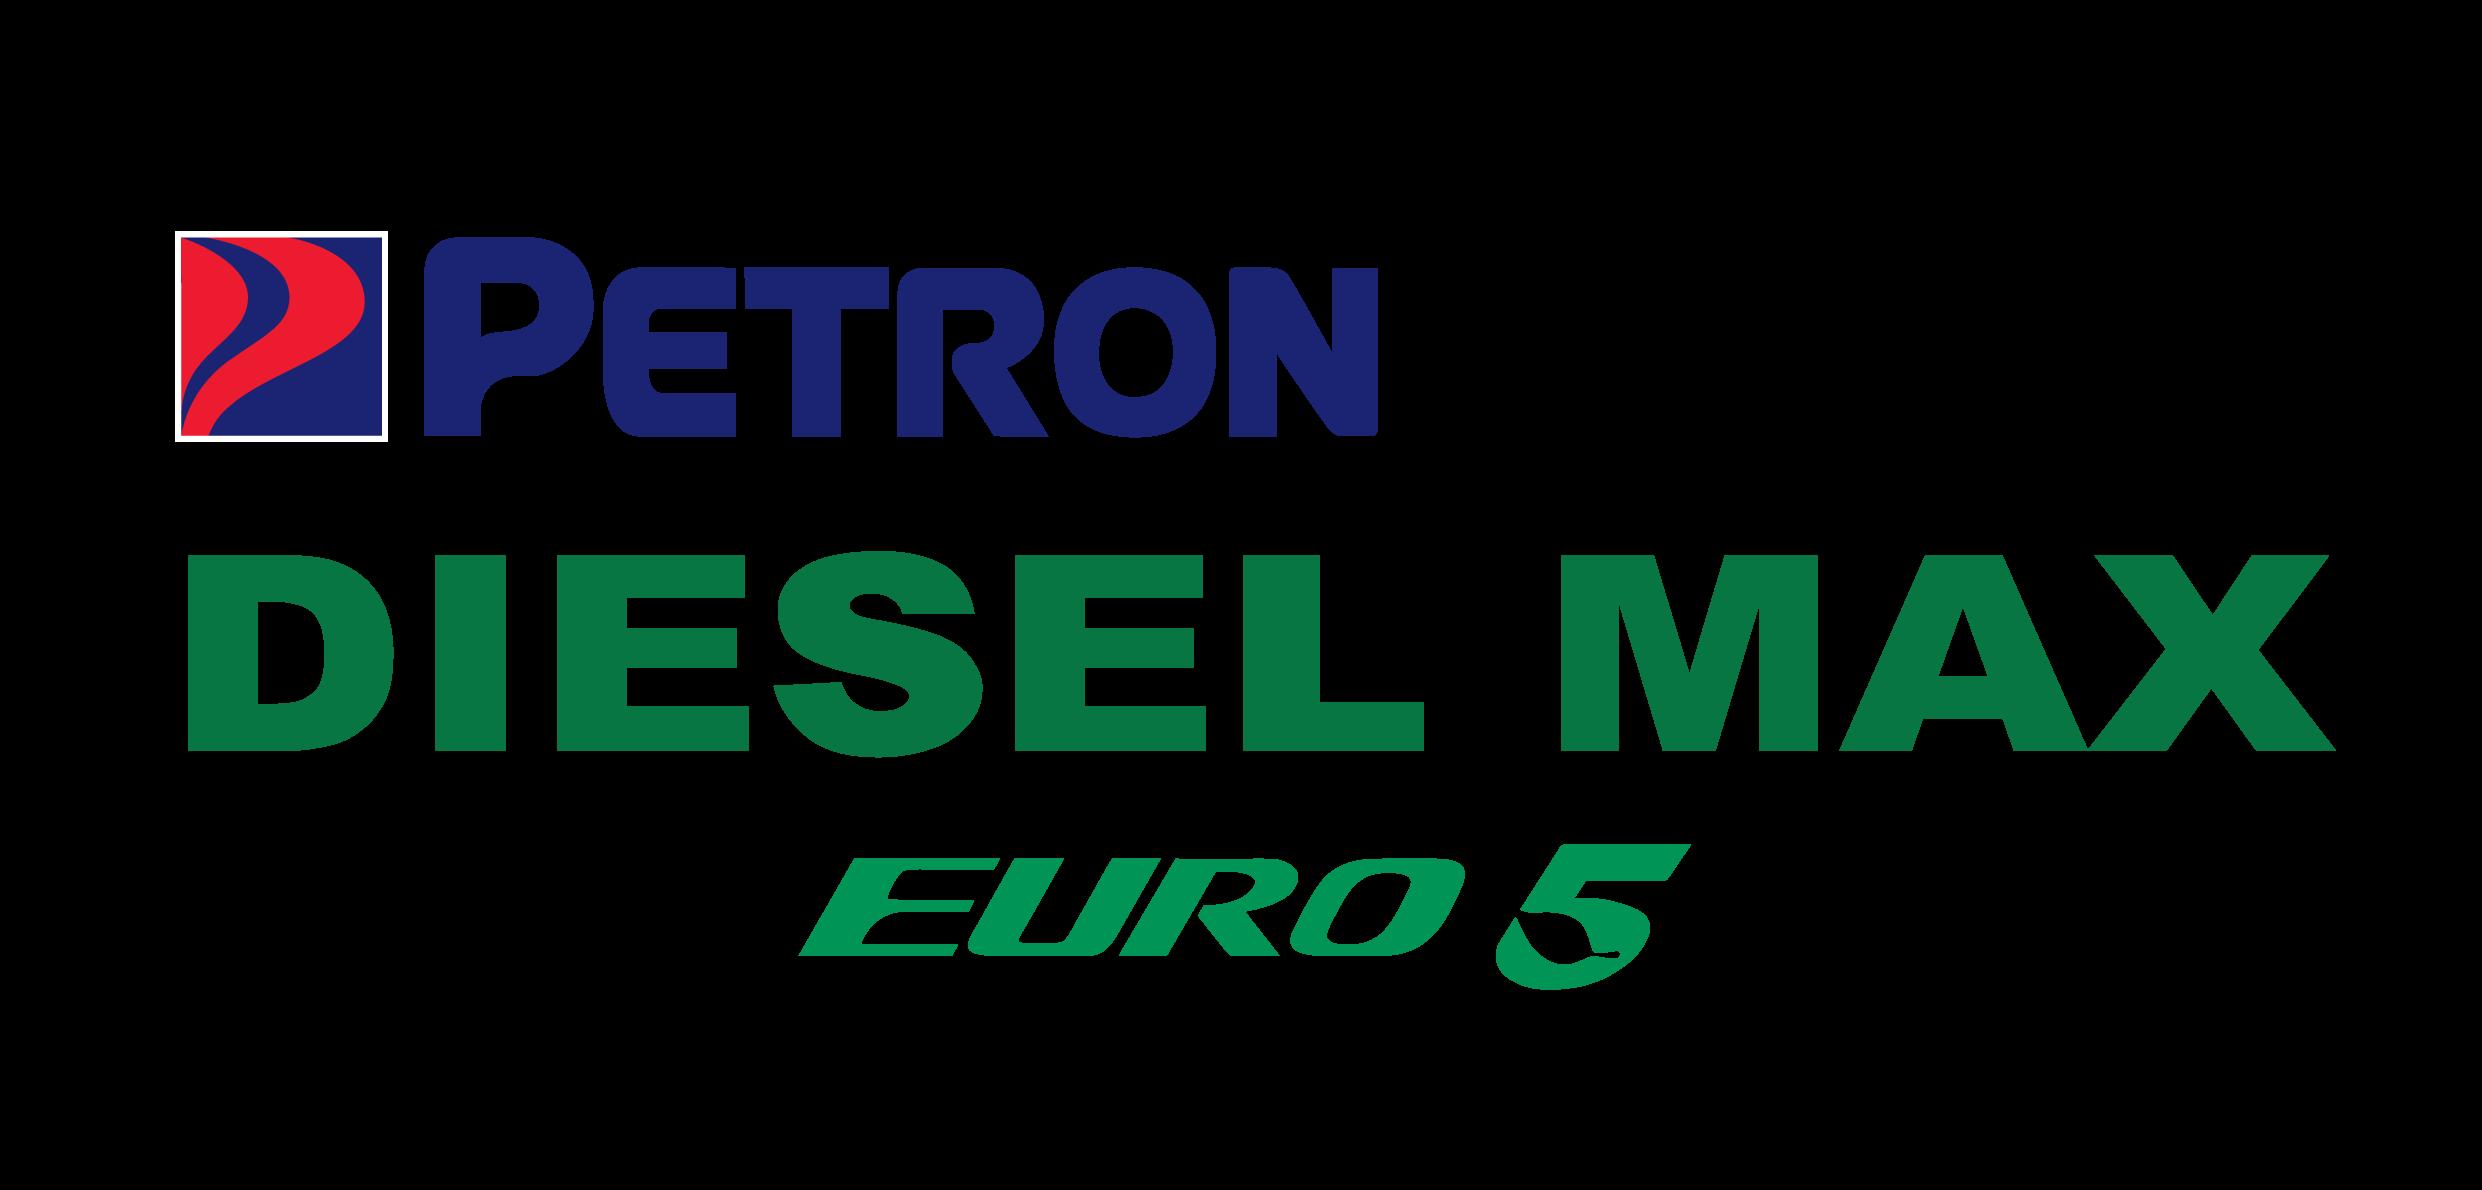 Petron Diesel Max